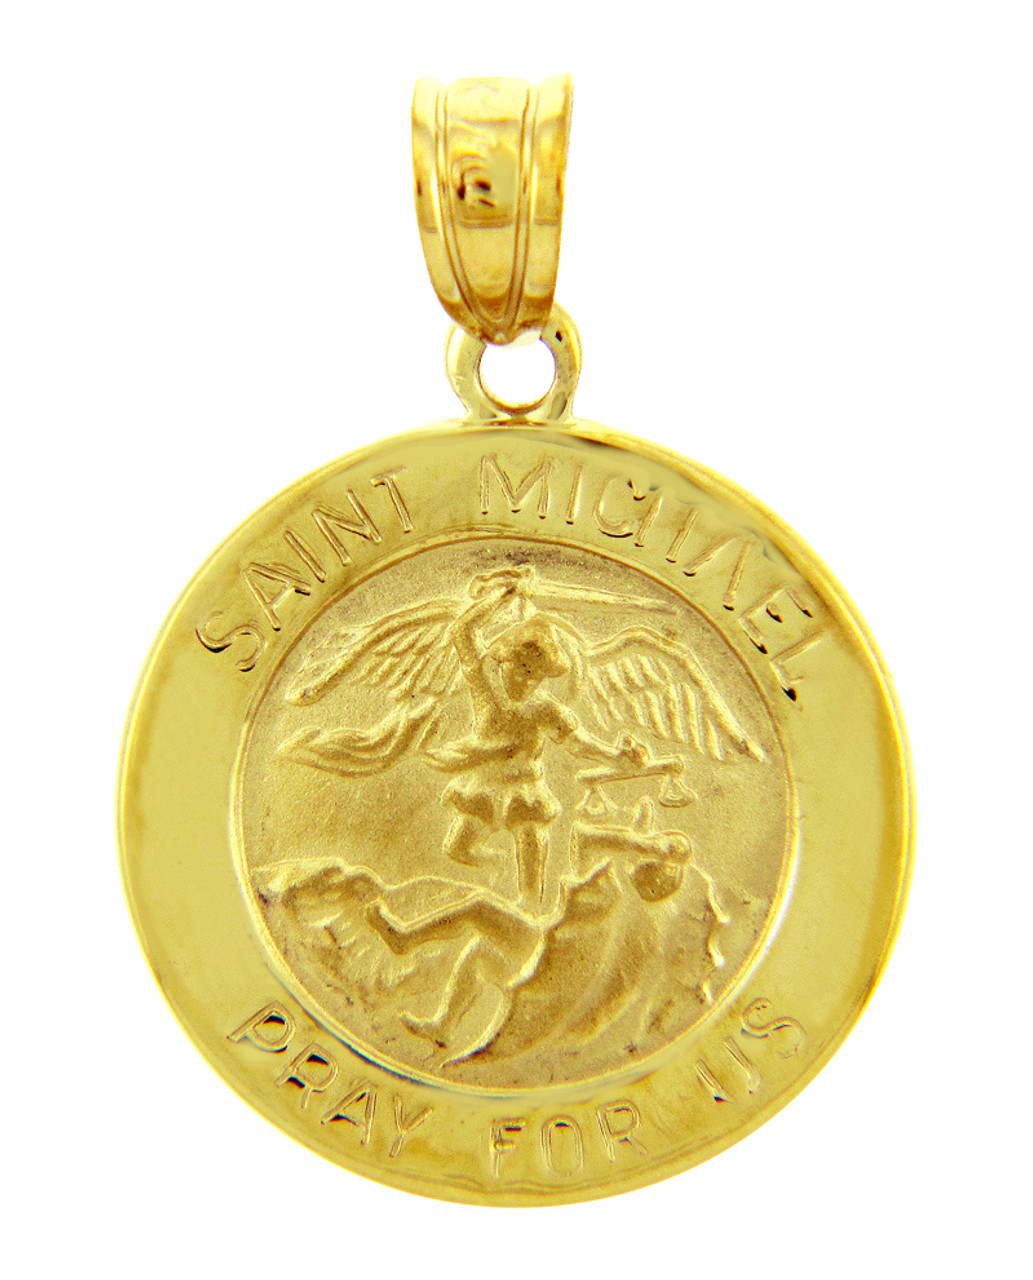 Gold religious pendants the saint michael pray for us yellow gold gold religious pendants the saint michael pray for us yellow gold pendant aloadofball Image collections